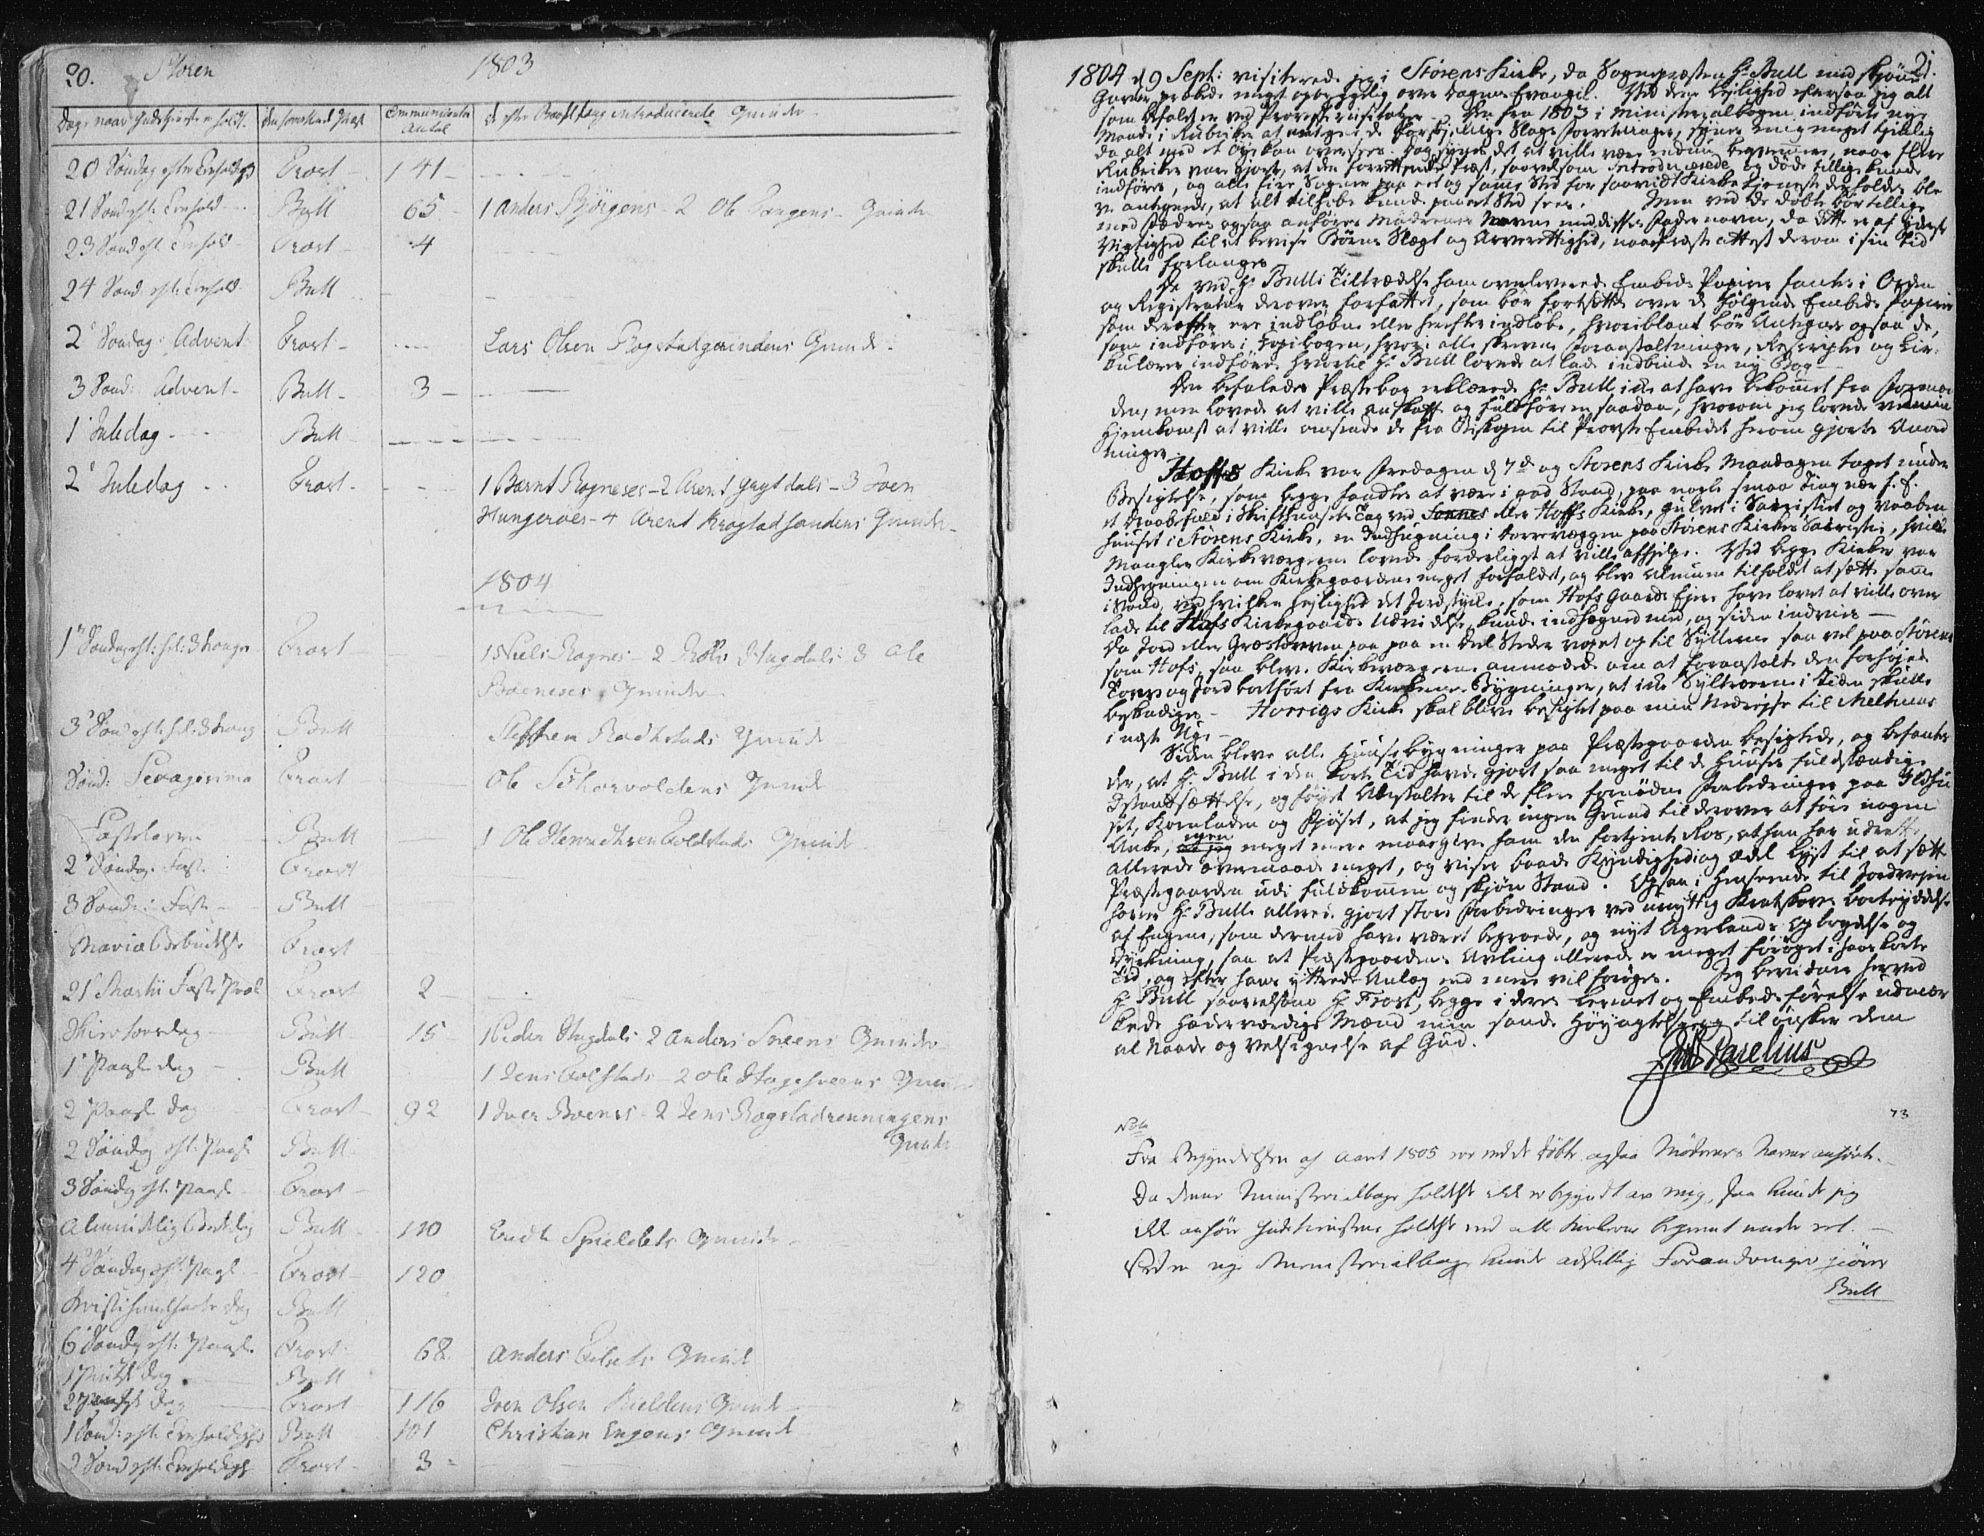 SAT, Ministerialprotokoller, klokkerbøker og fødselsregistre - Sør-Trøndelag, 687/L0992: Parish register (official) no. 687A03 /1, 1788-1815, p. 20-21